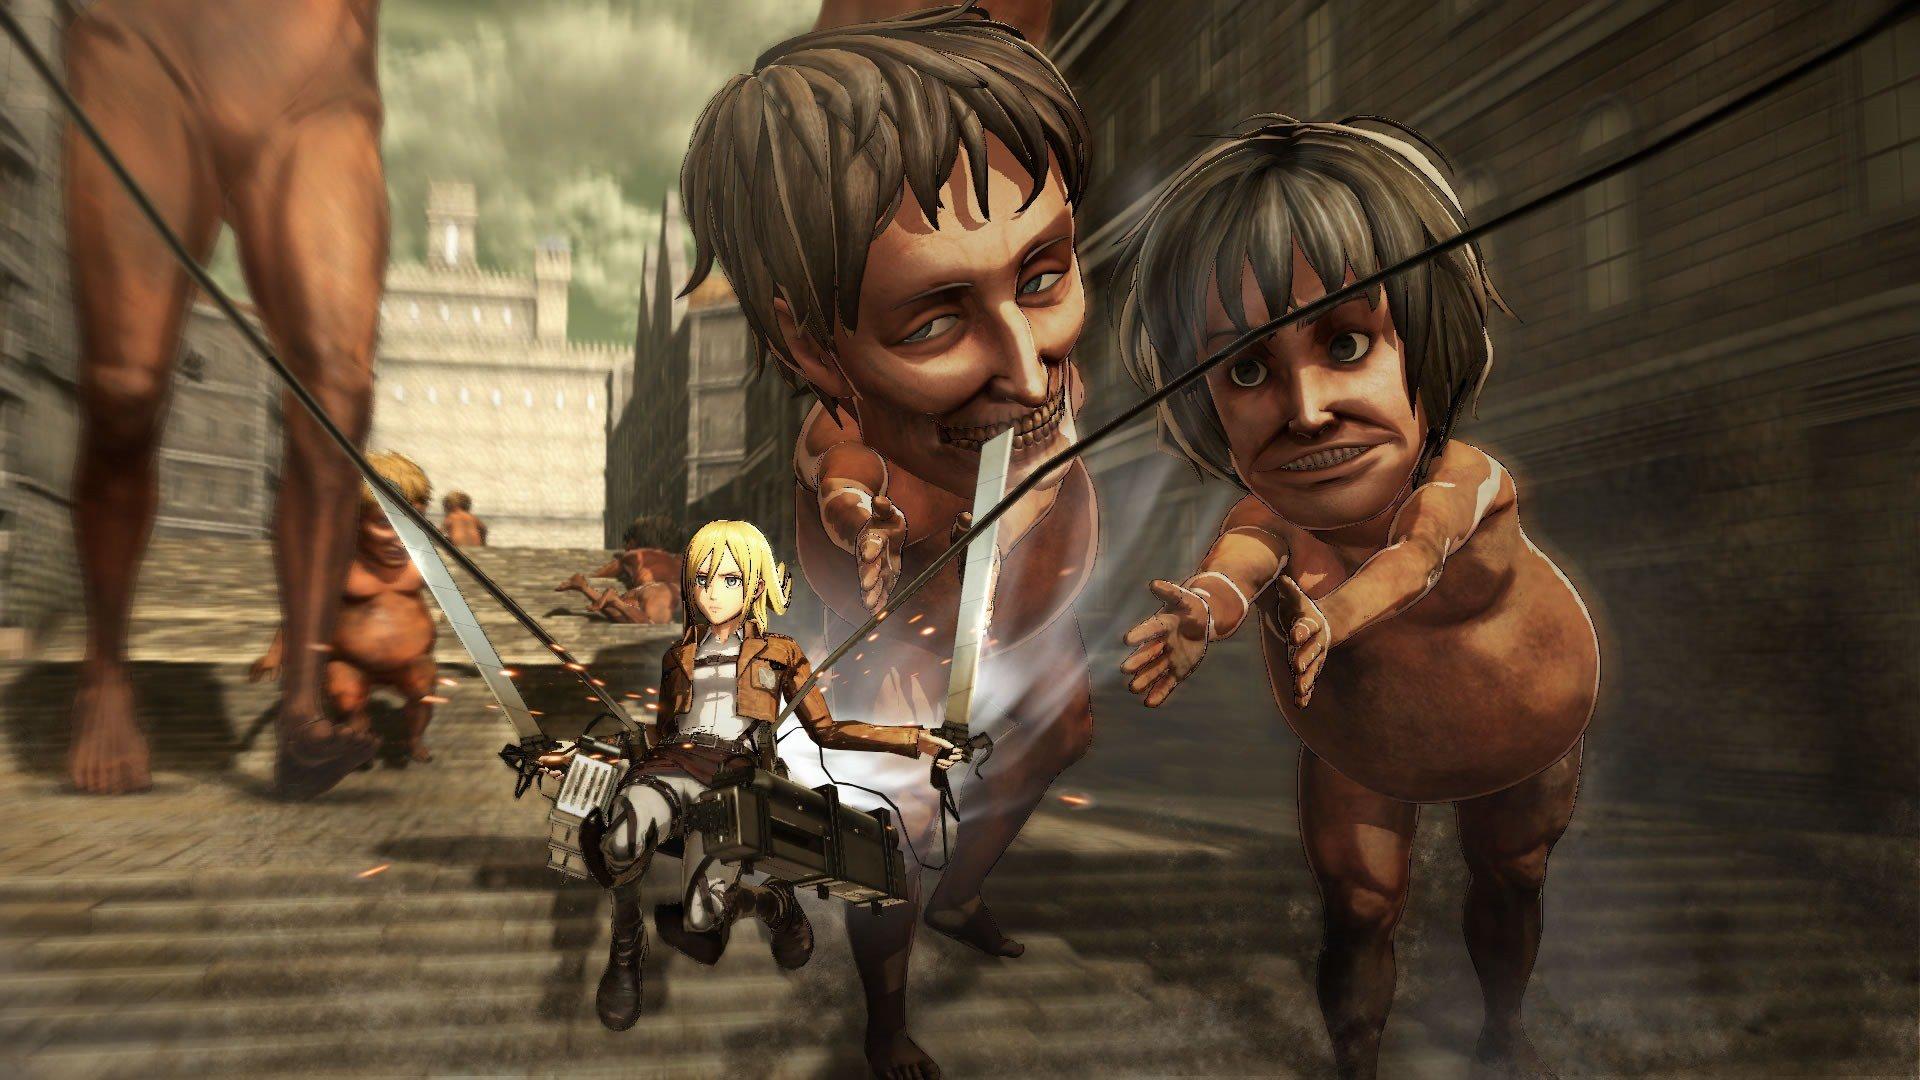 Attack on Titan Game - Find the Best 3D Maneuver Gear | Tips | Prima Games